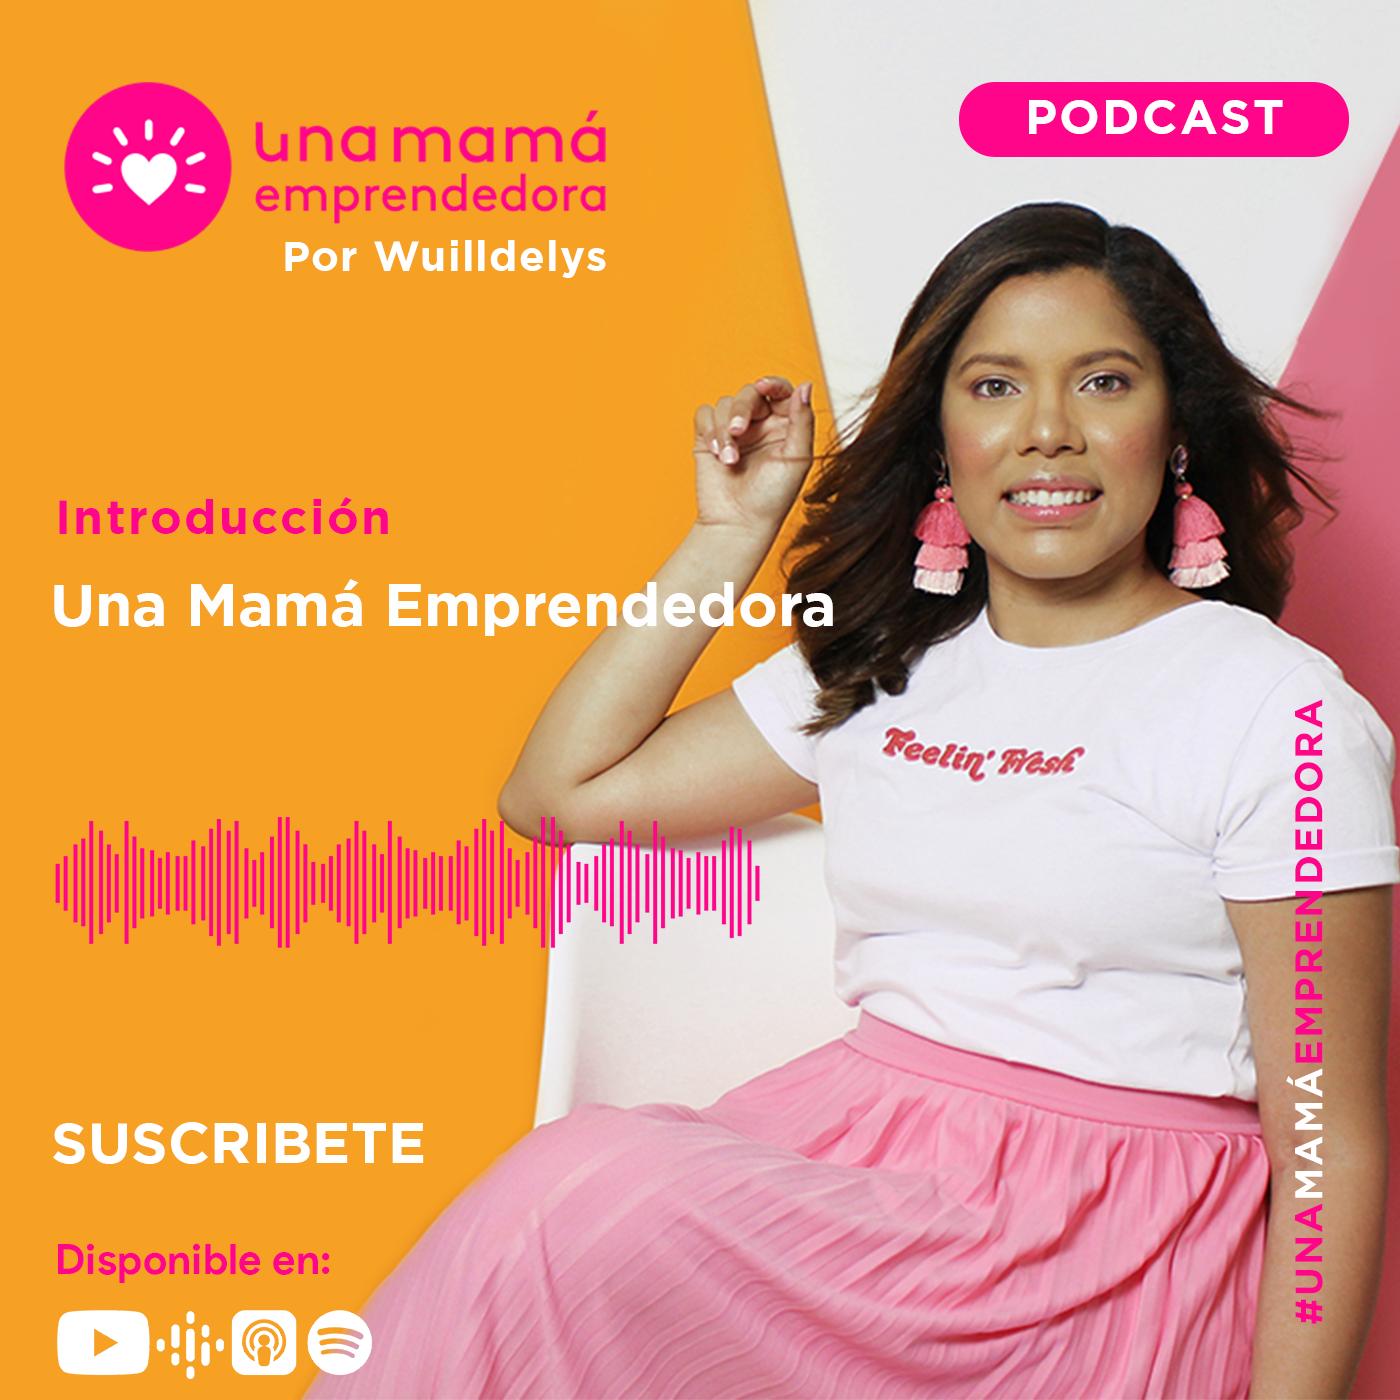 Podcast Una Mamá Emprendedora